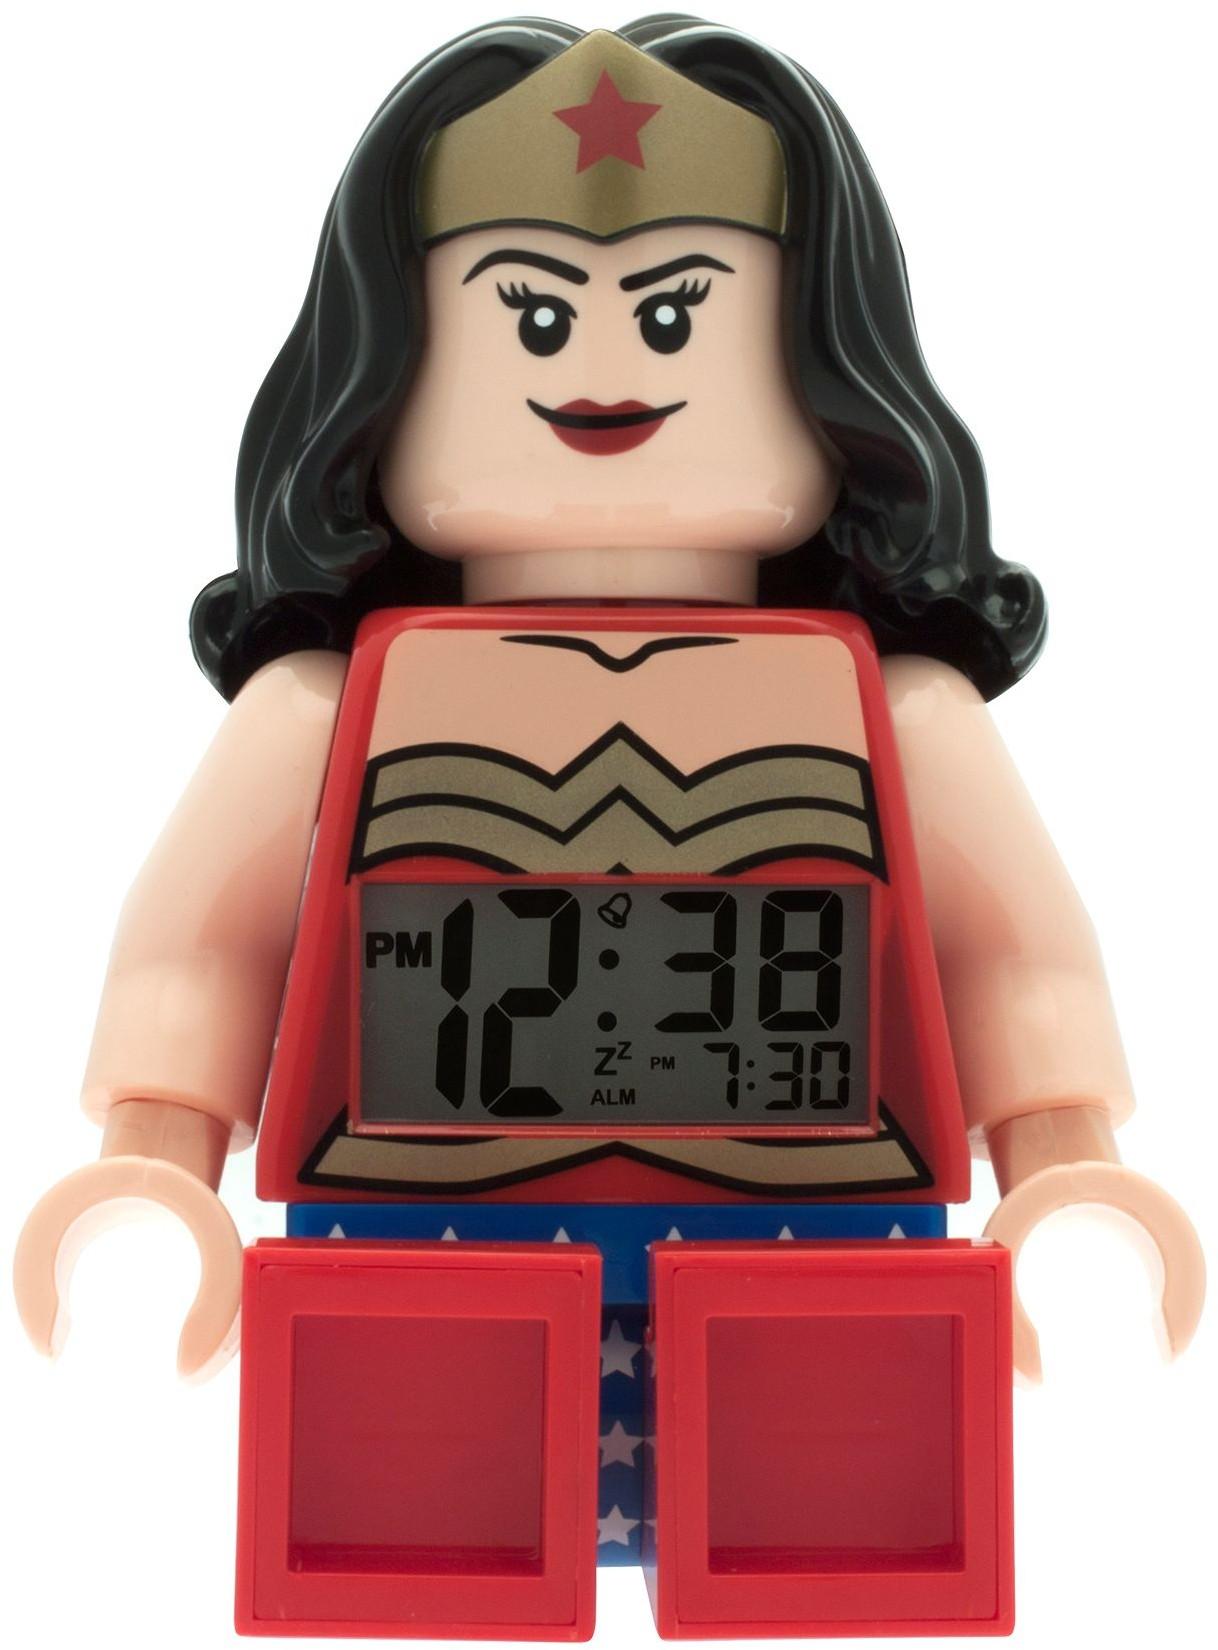 lego minifigure alarm clock instructions